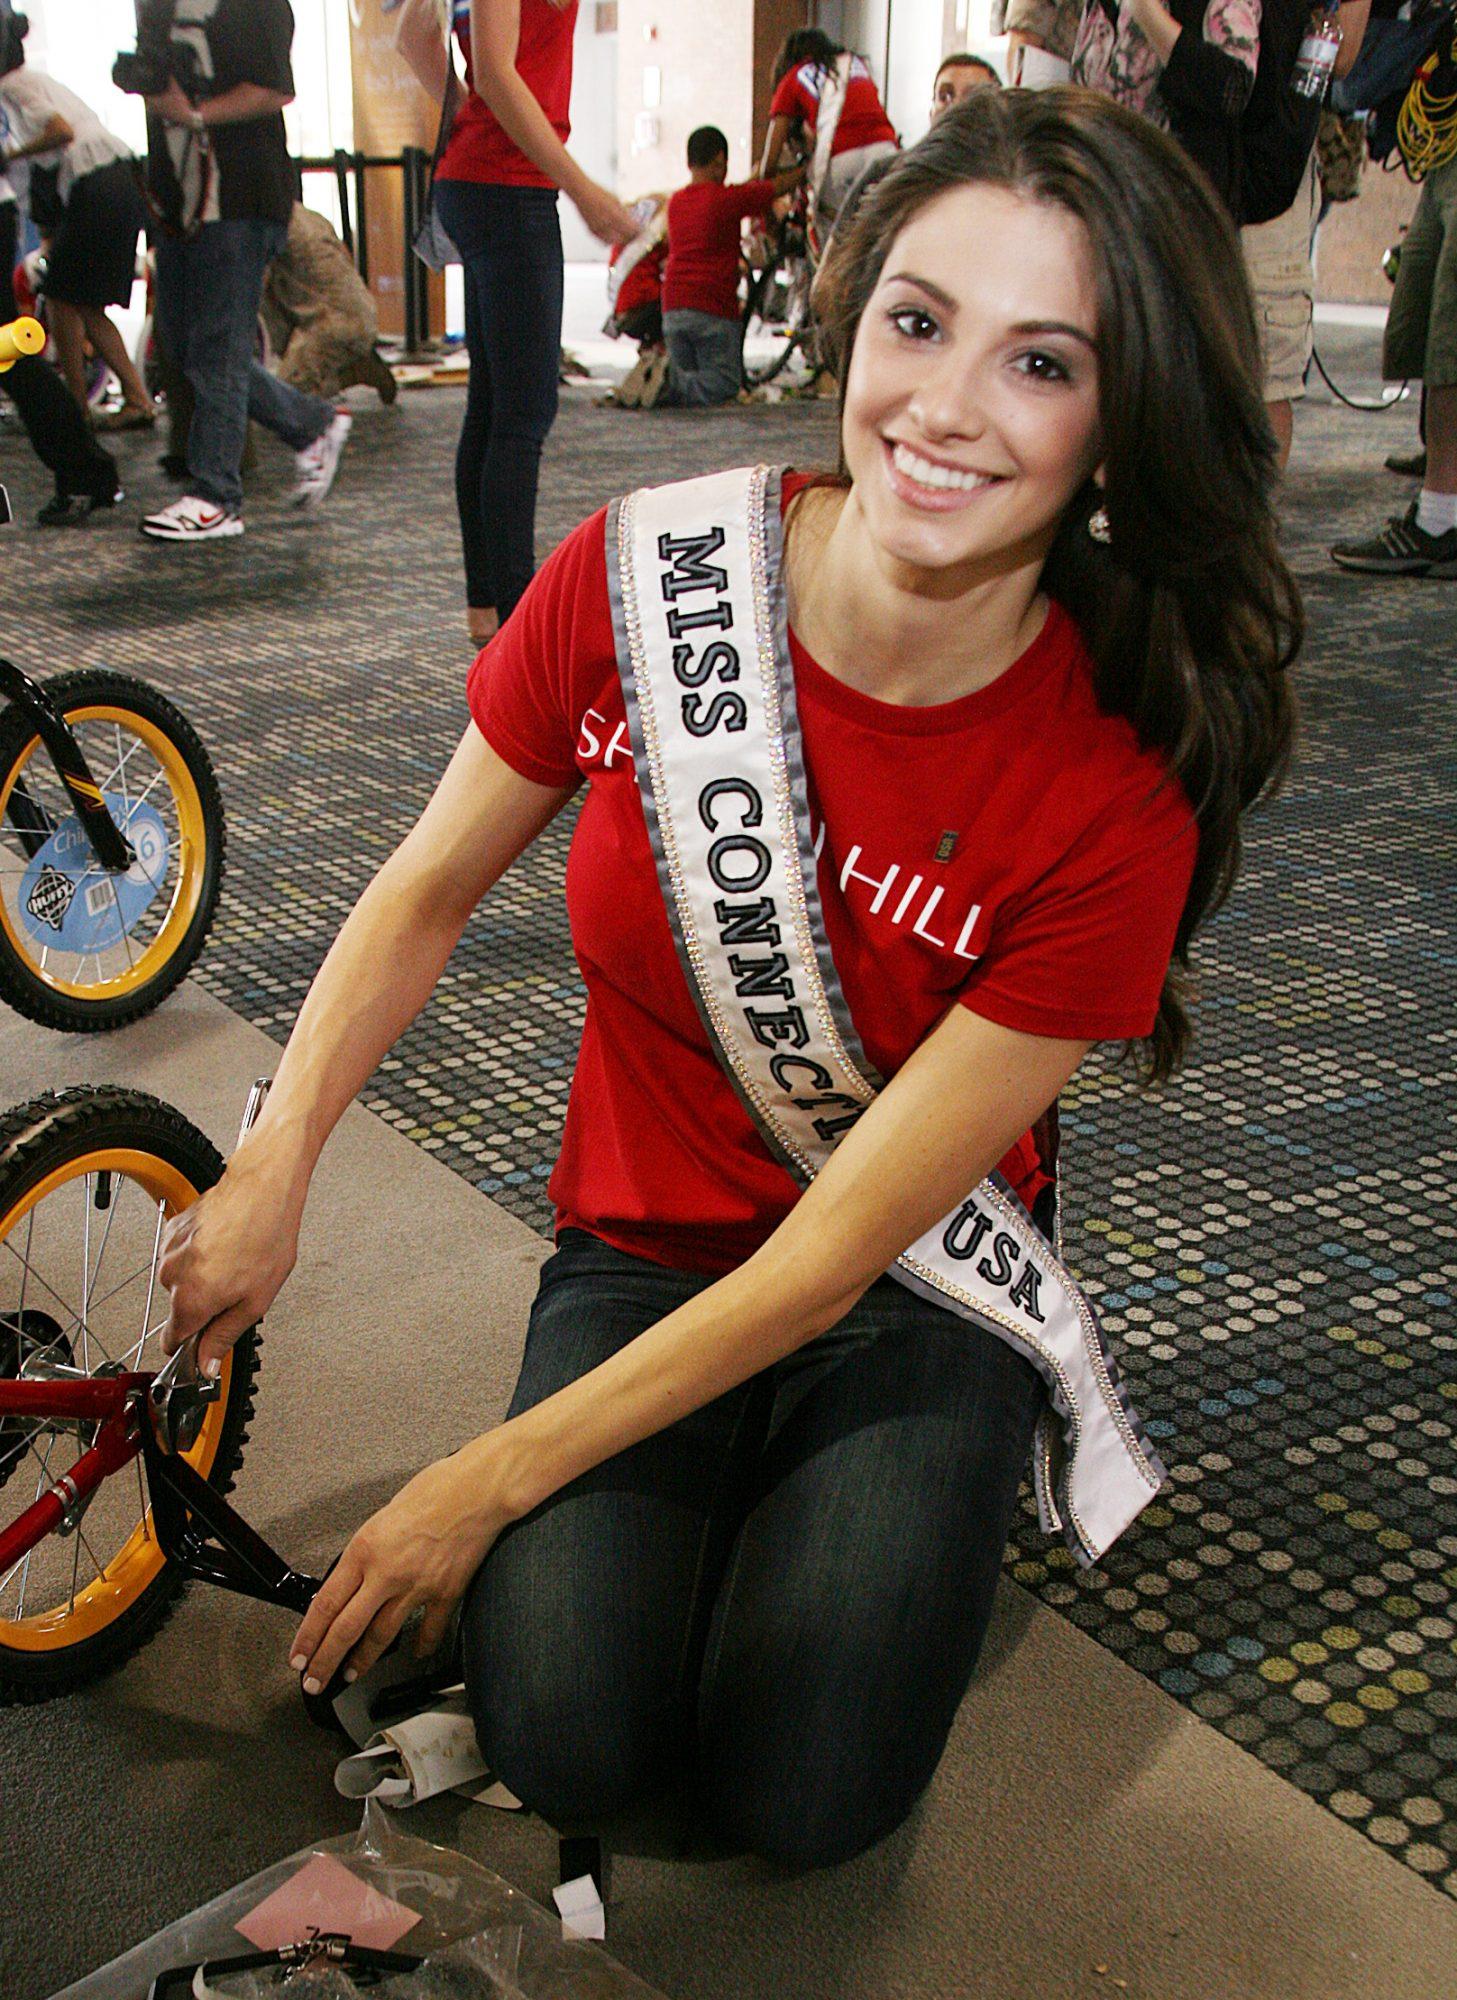 Miss Connecticut USA 2011 Regina Turner